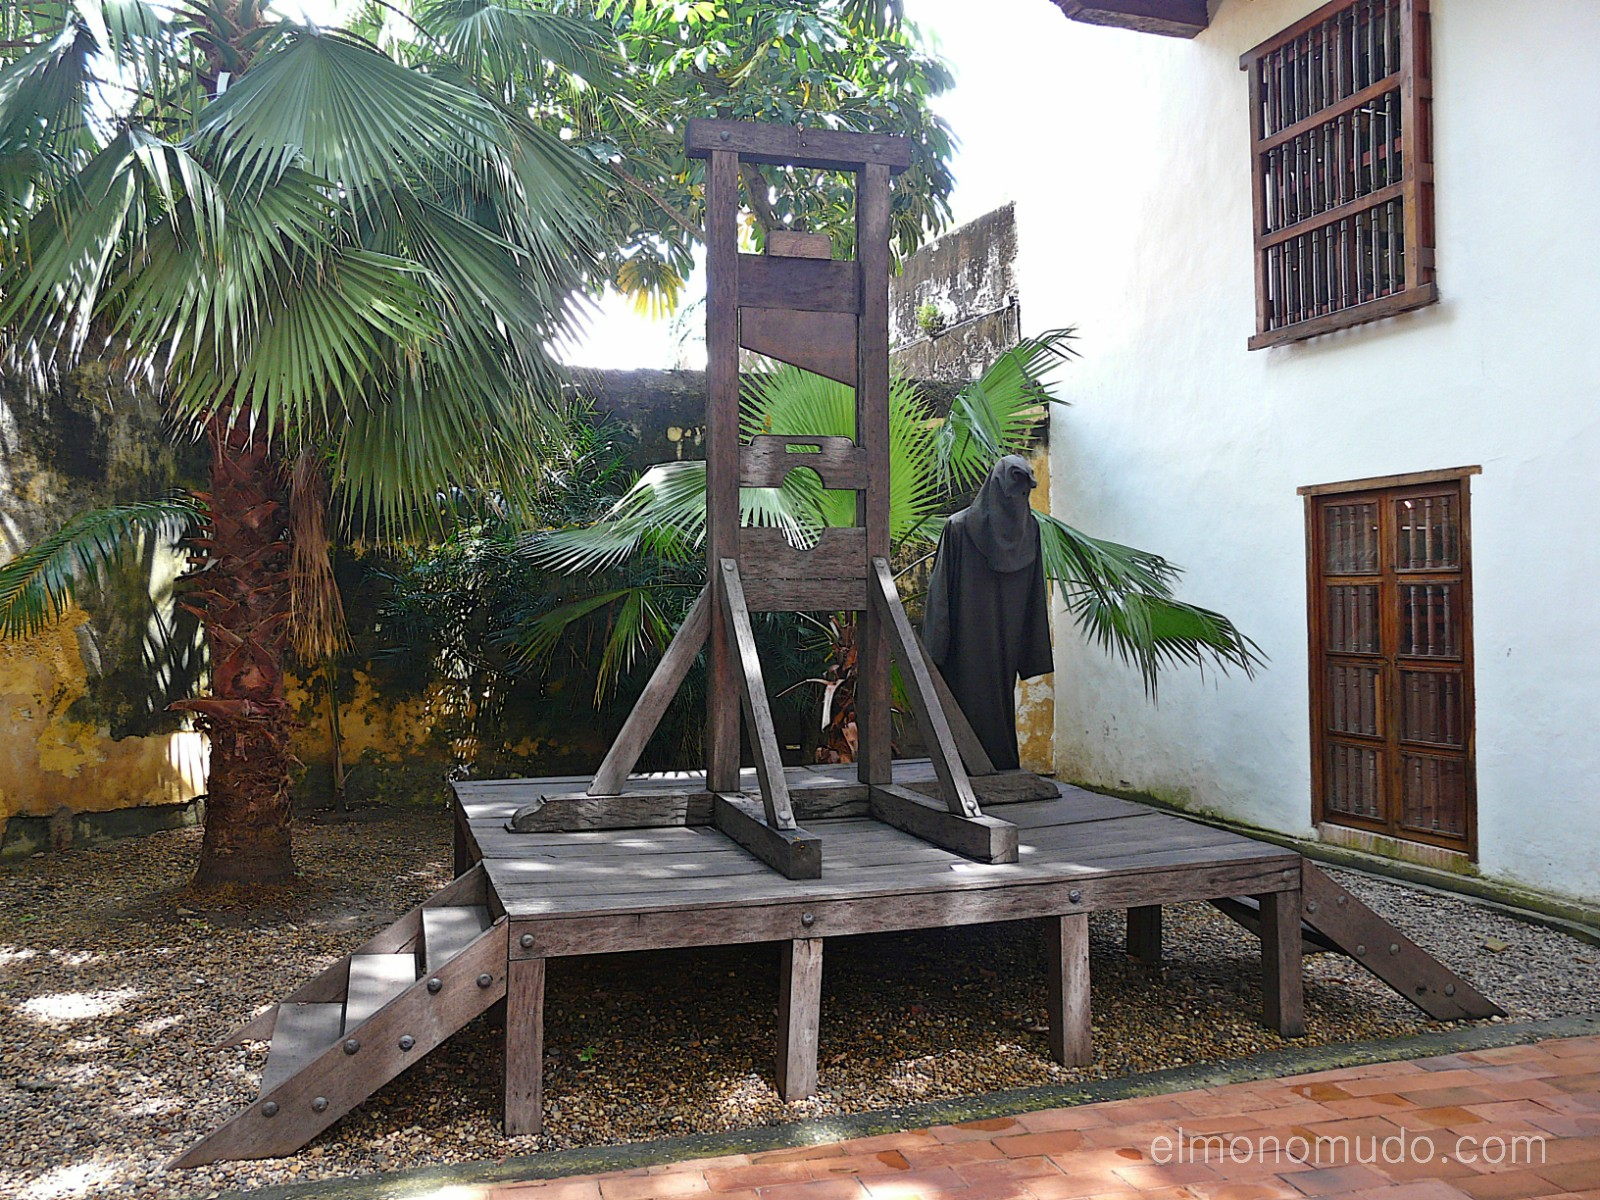 Instrumentos  de tortura reales P1080583-1600x1200